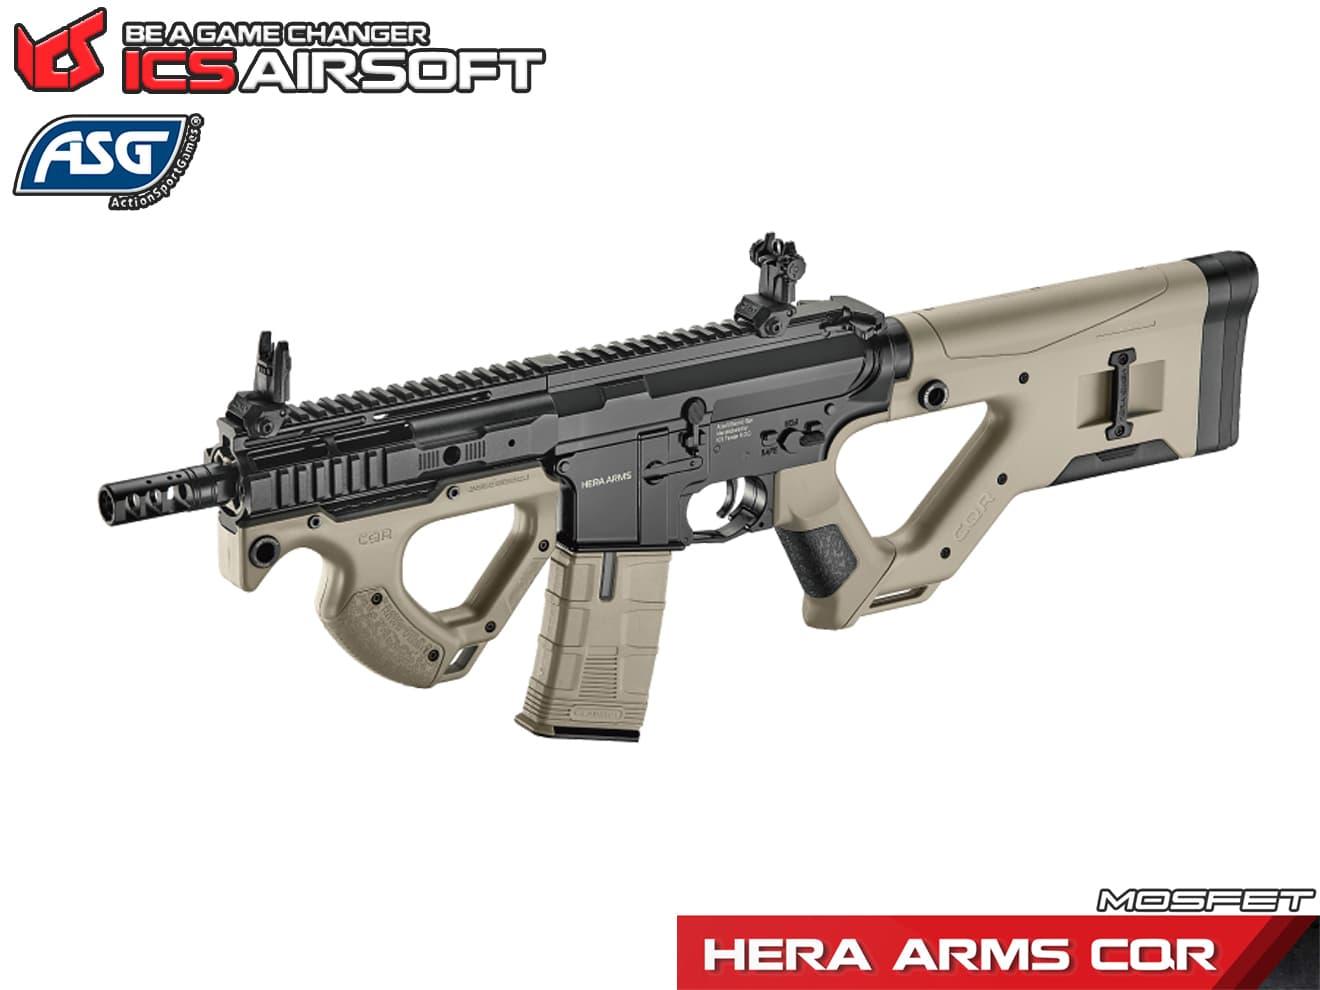 ICS×ASG HERA ARMS CQR AEG Two-Tone MOSFET+EBB JP Ver.◆HERA ARMS正規ライセンス取得 電動ガン ライフル ツートン  CXB EBB搭載